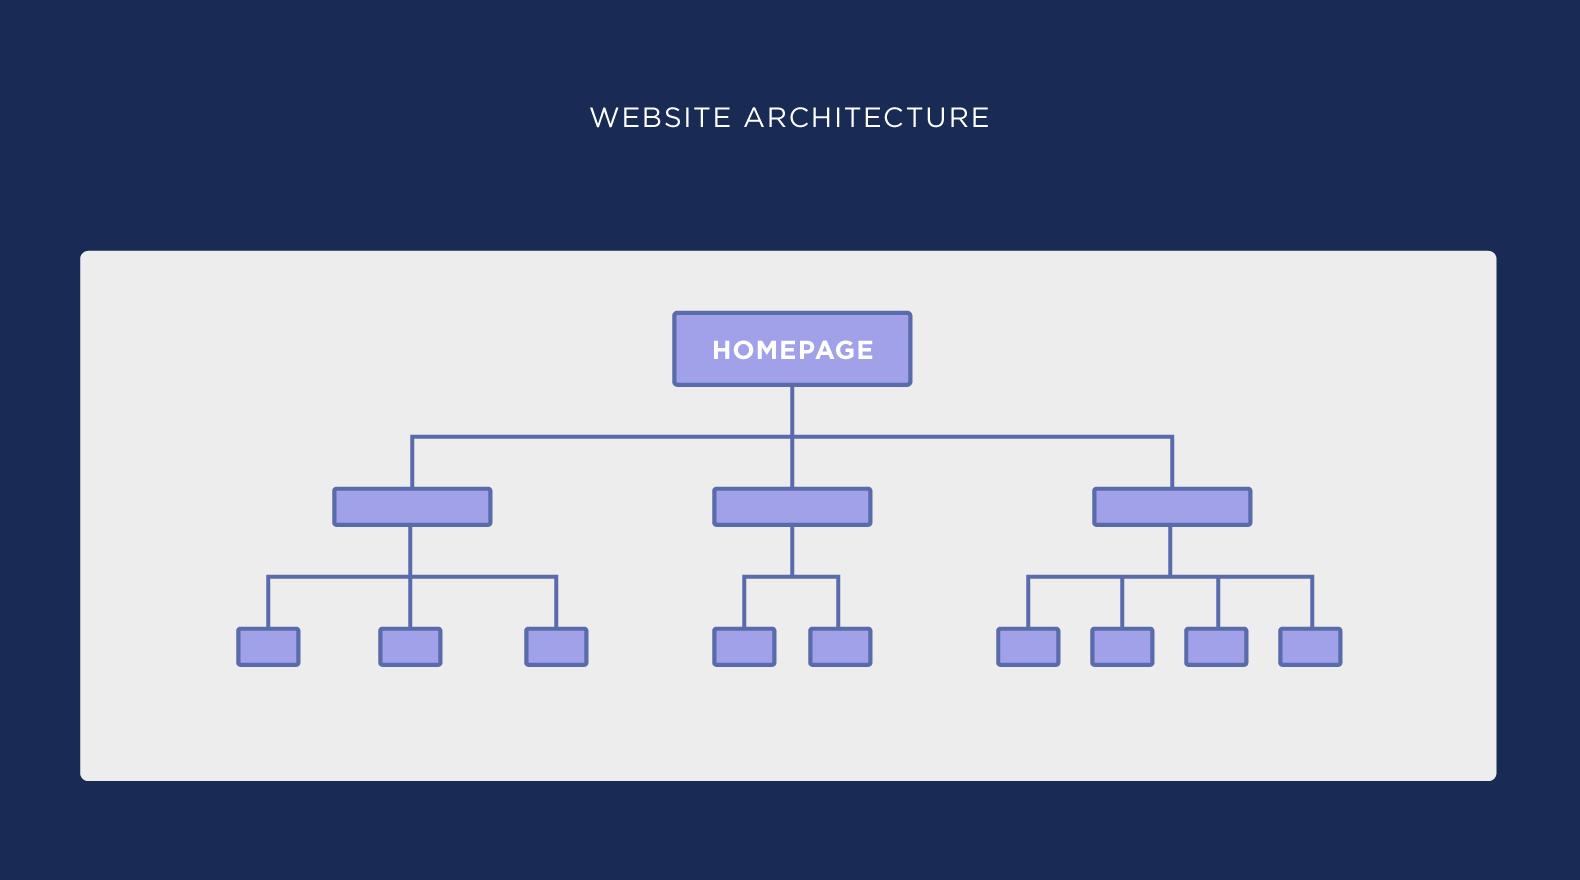 معماری سایت پیچیده